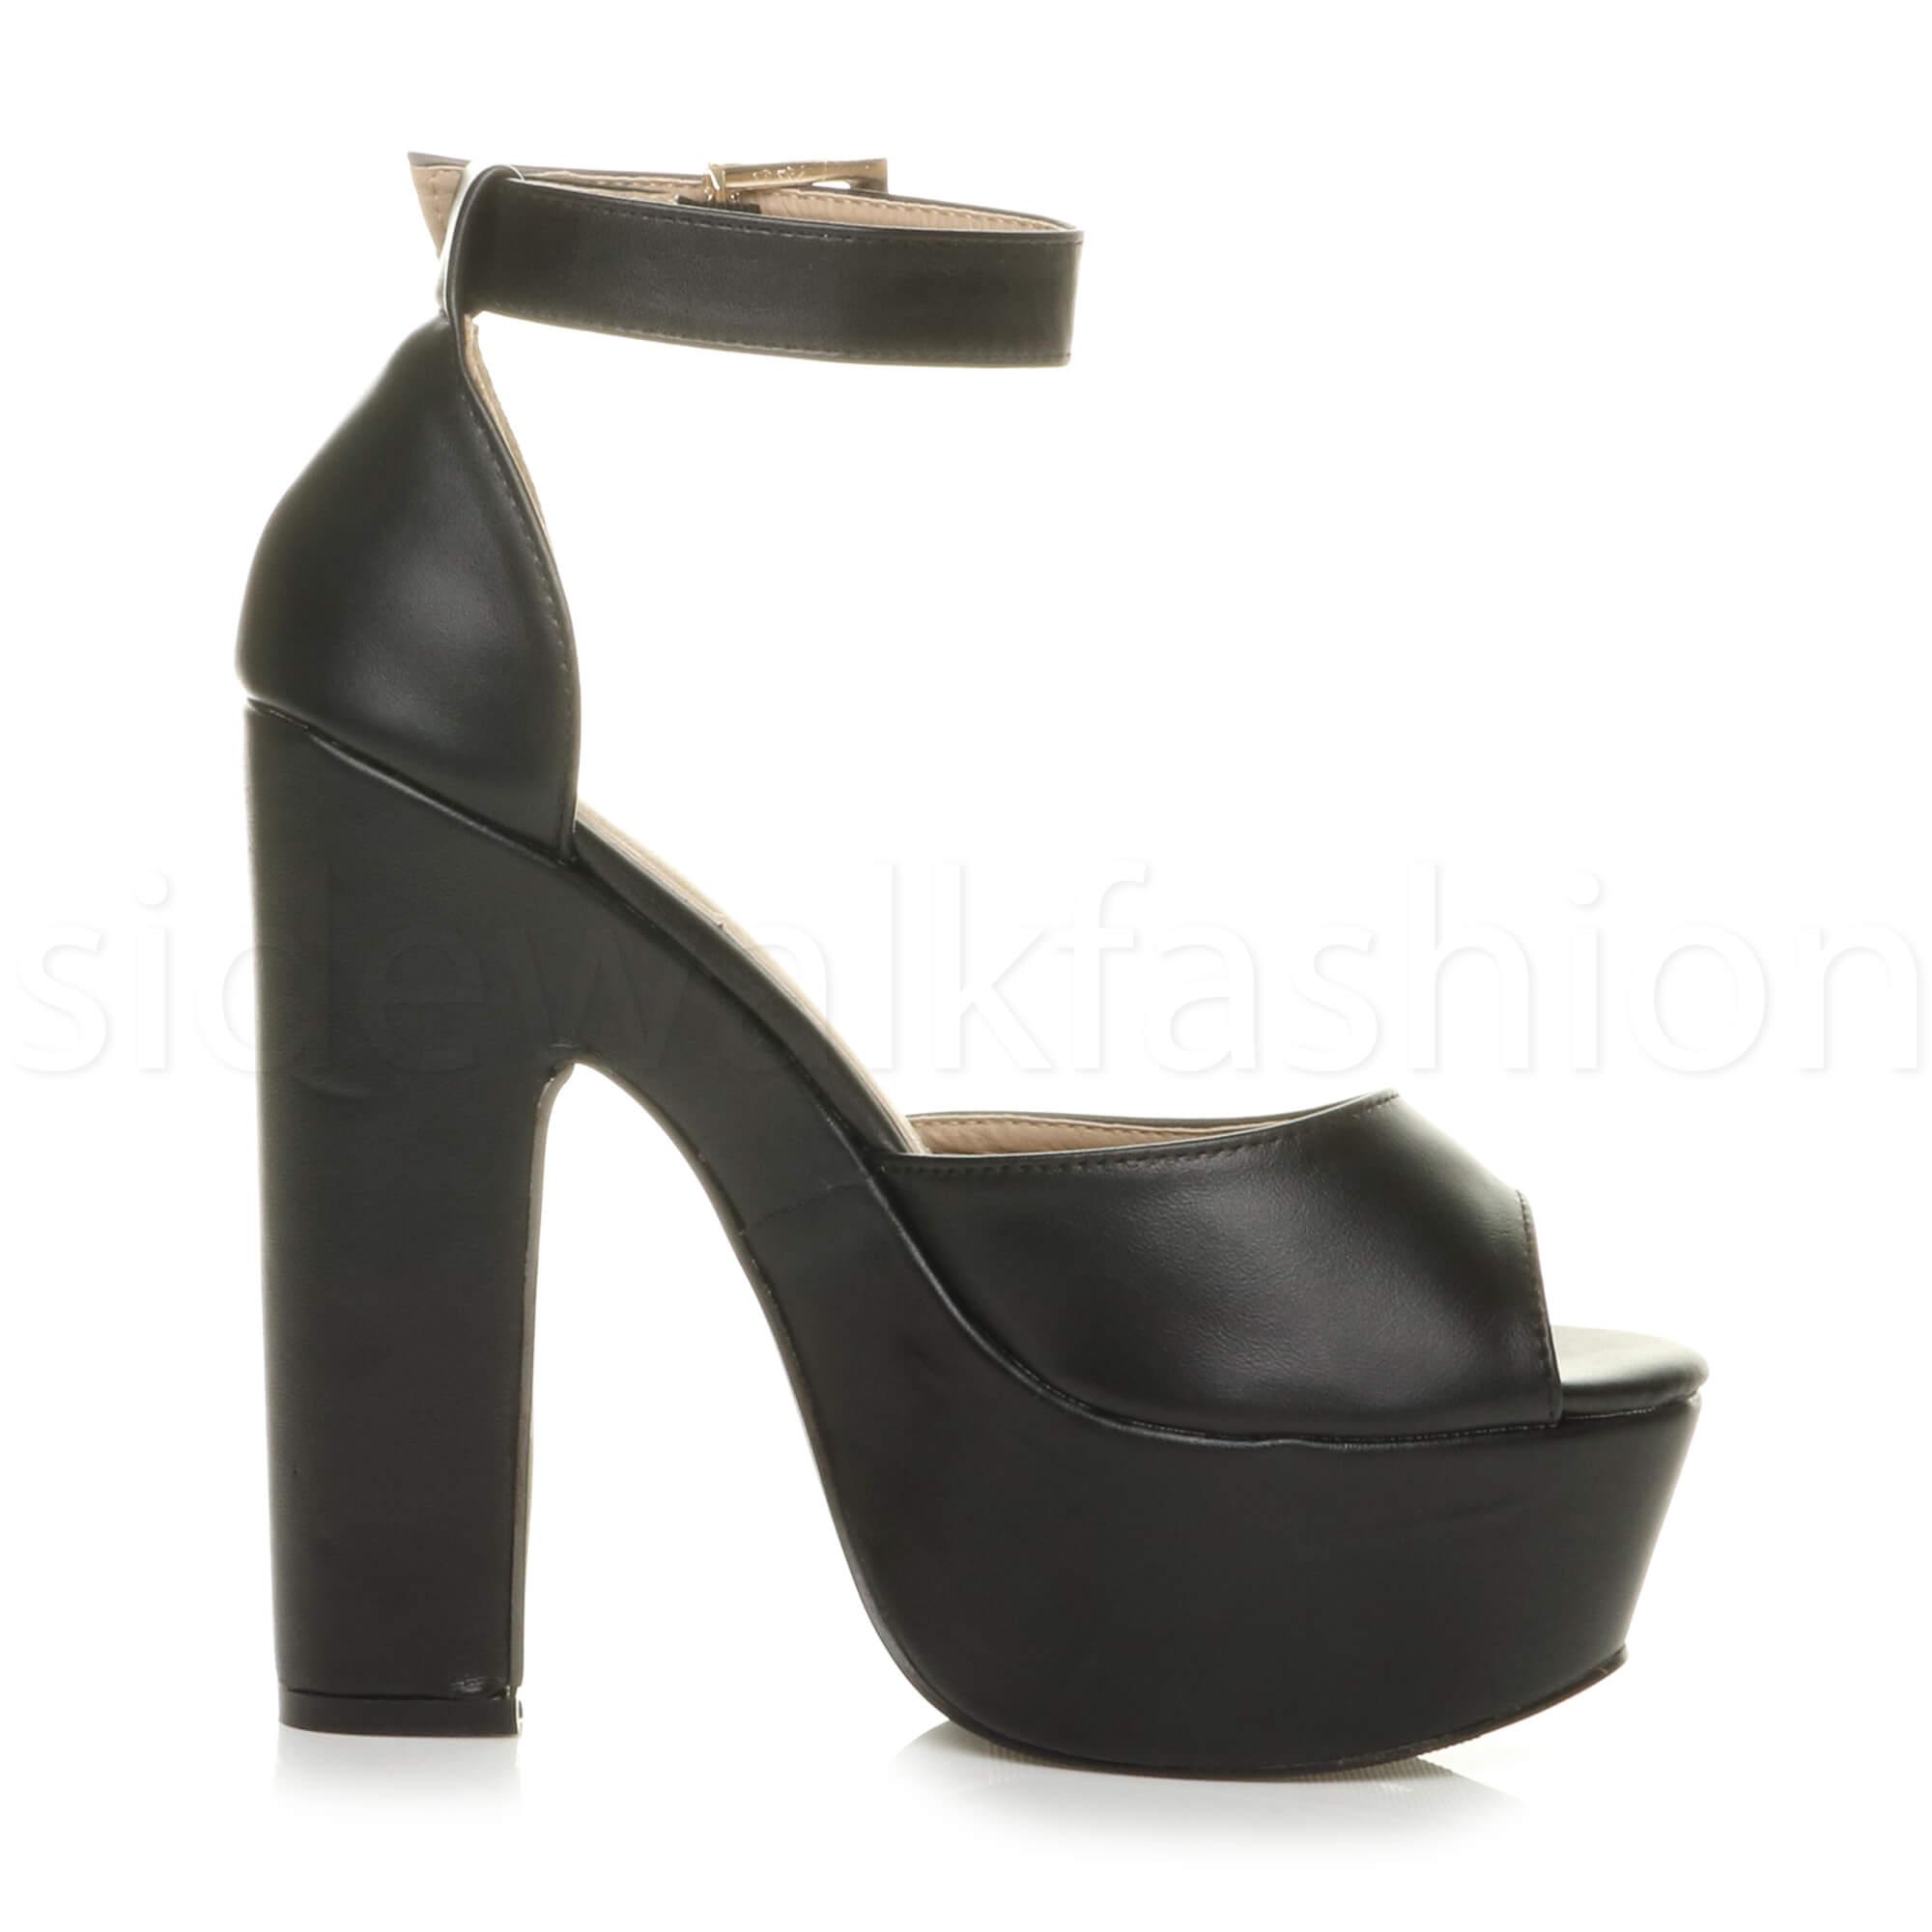 Womens-ladies-high-block-heel-peep-toe-shoes-evening-party-platform-sandals-size thumbnail 9